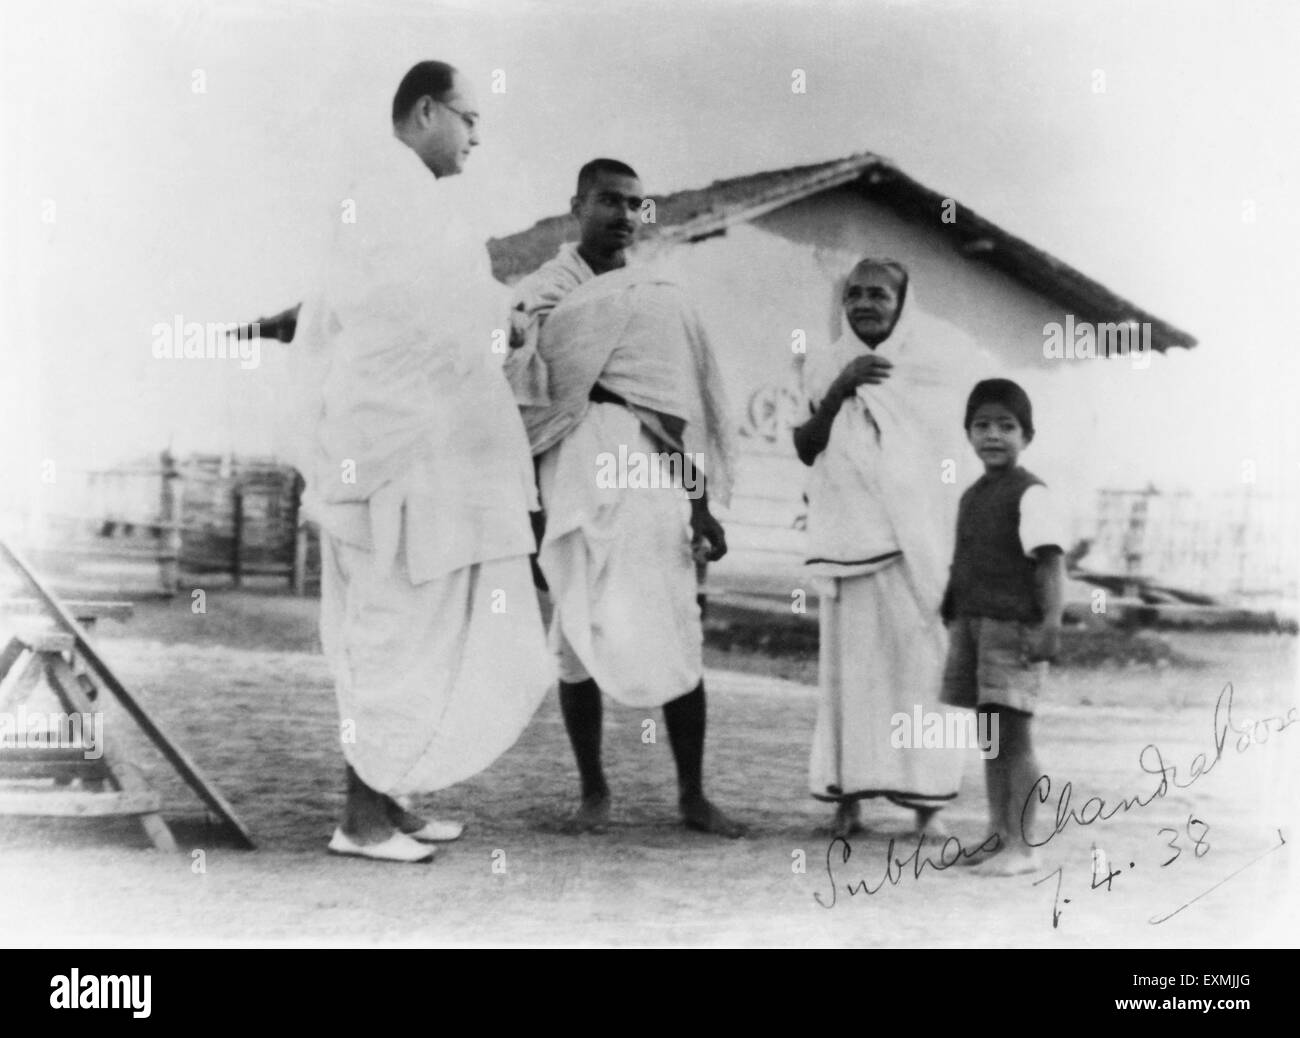 Subhas Chandra Bose ; Kanu Gandhi ; Kasturba Gandhi and Kahandas in front of Mahatma Gandhi's hut at Sevagram - Stock Image